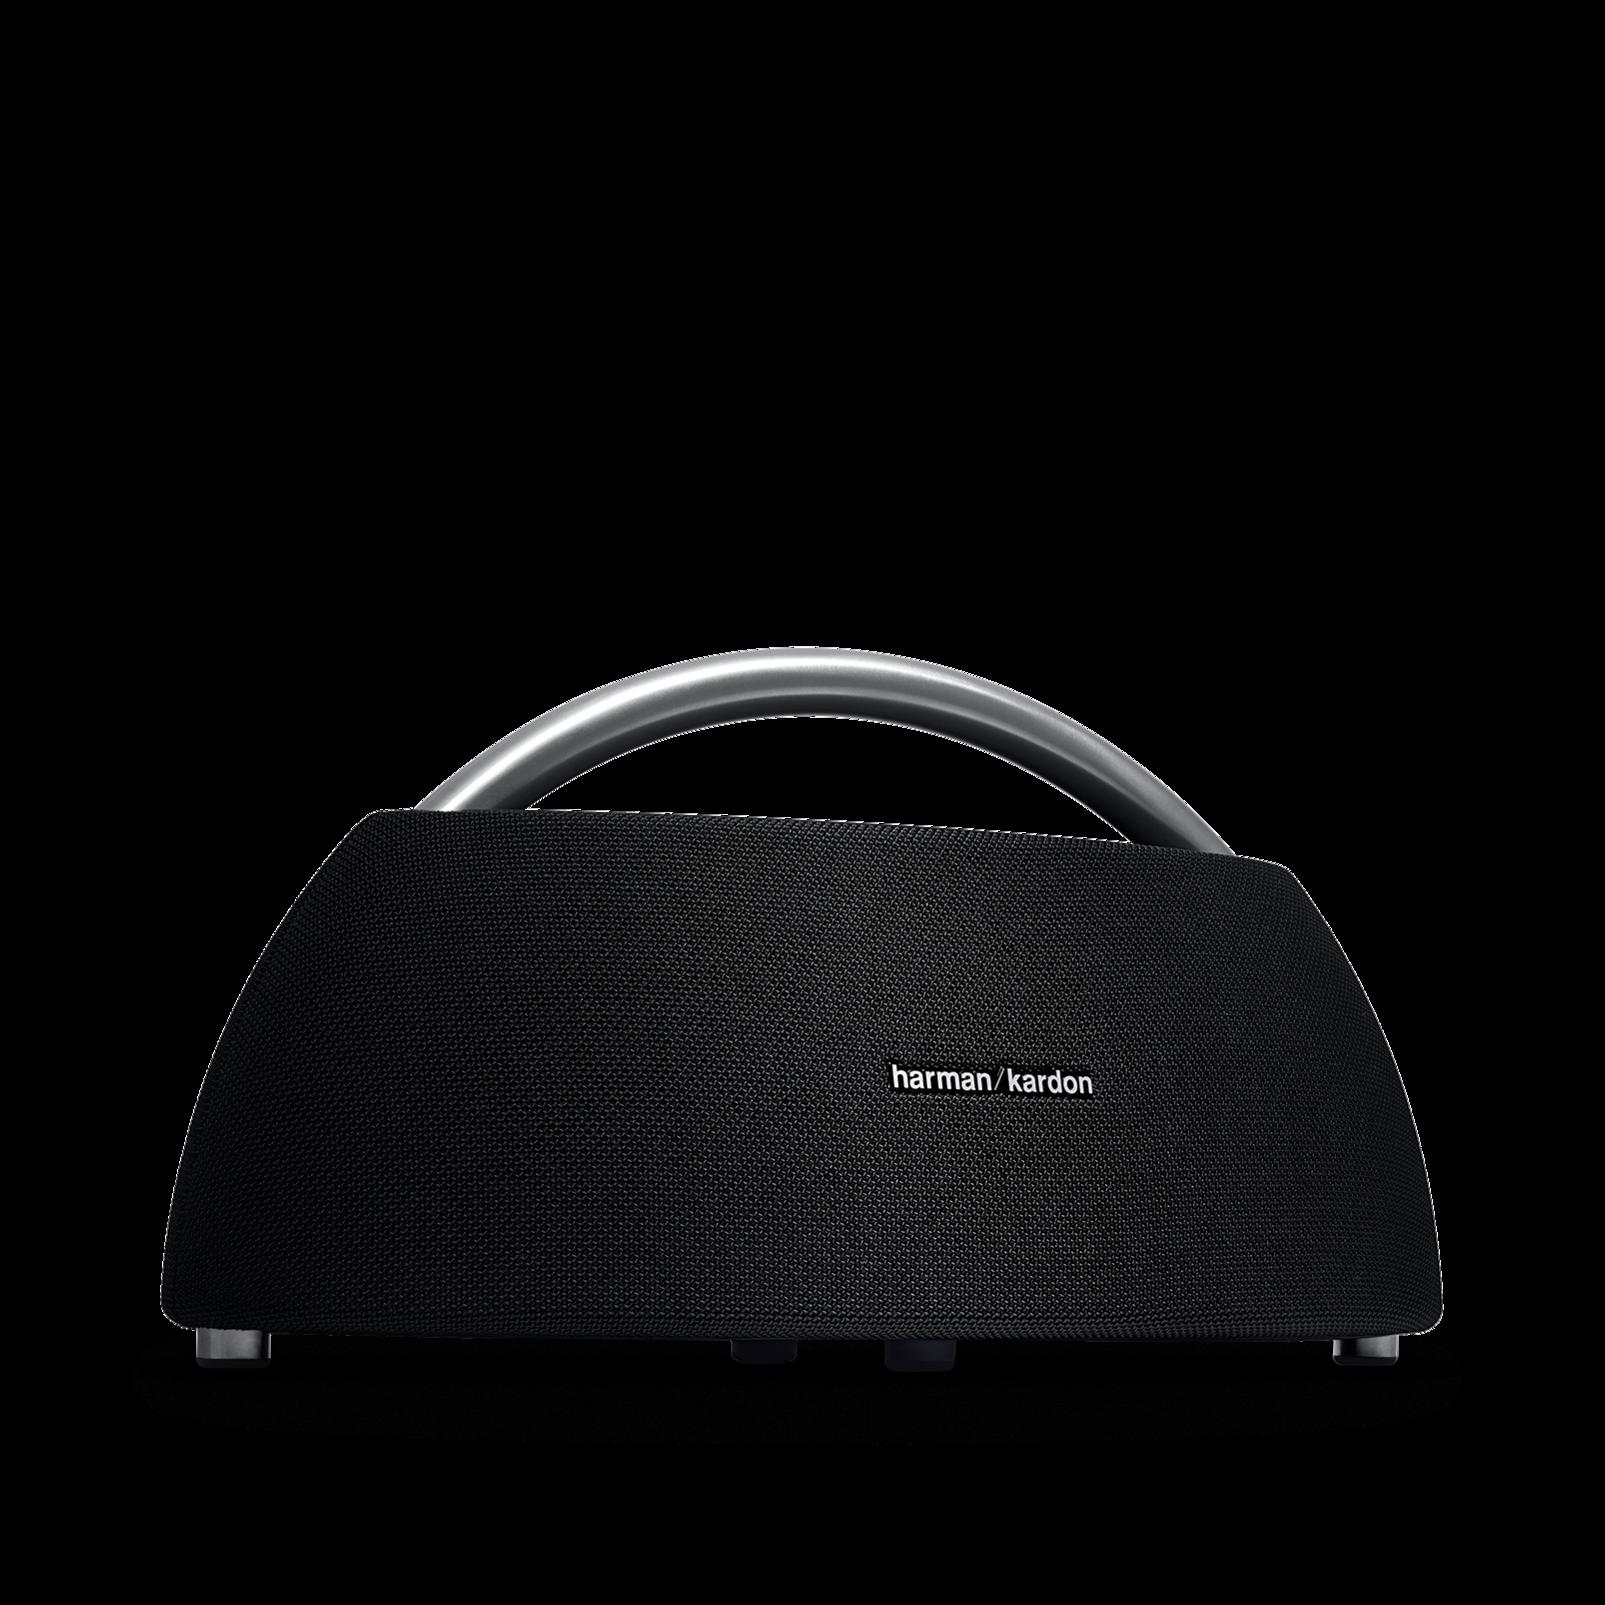 Harman Kardon Go Play Mini Portable Bluetooth Speaker - Black (GOPLAYMINI-BK)